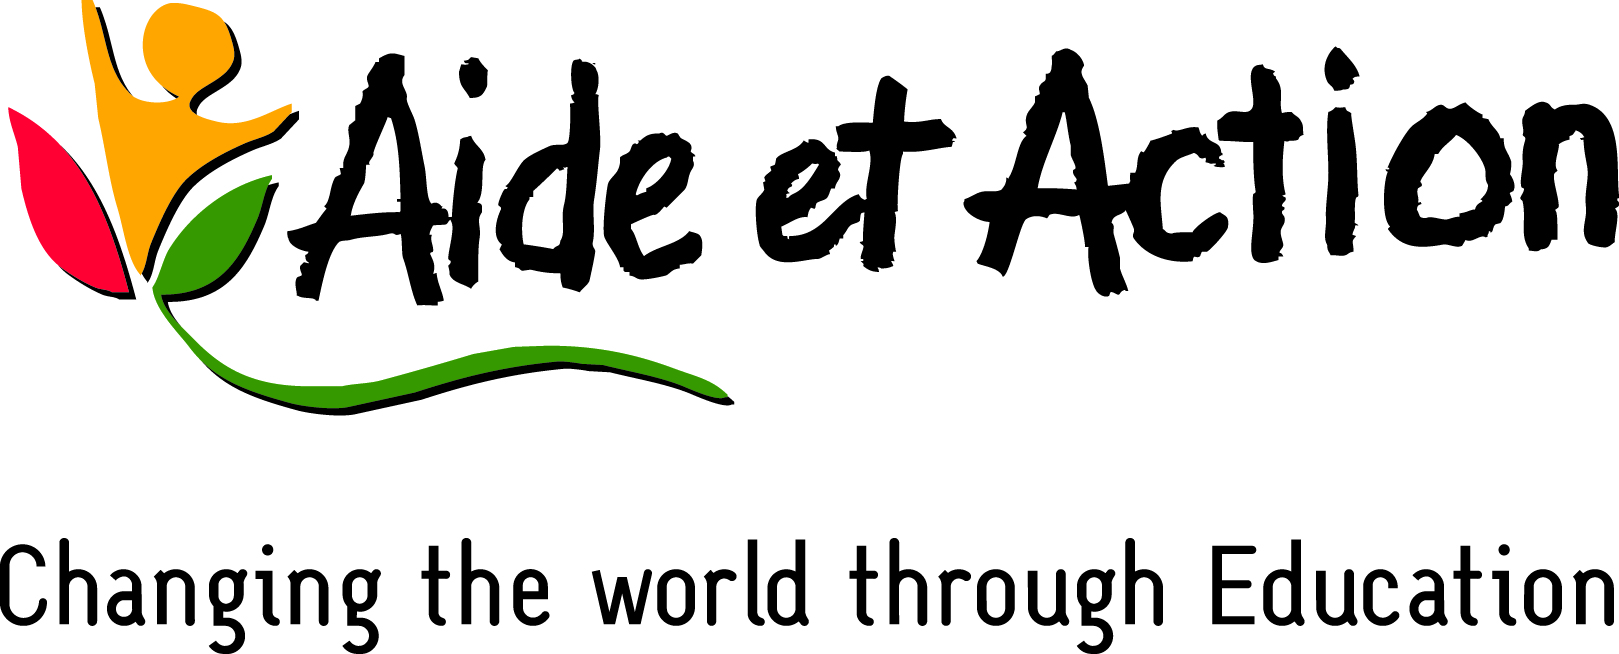 Aide et Action - Switzerland